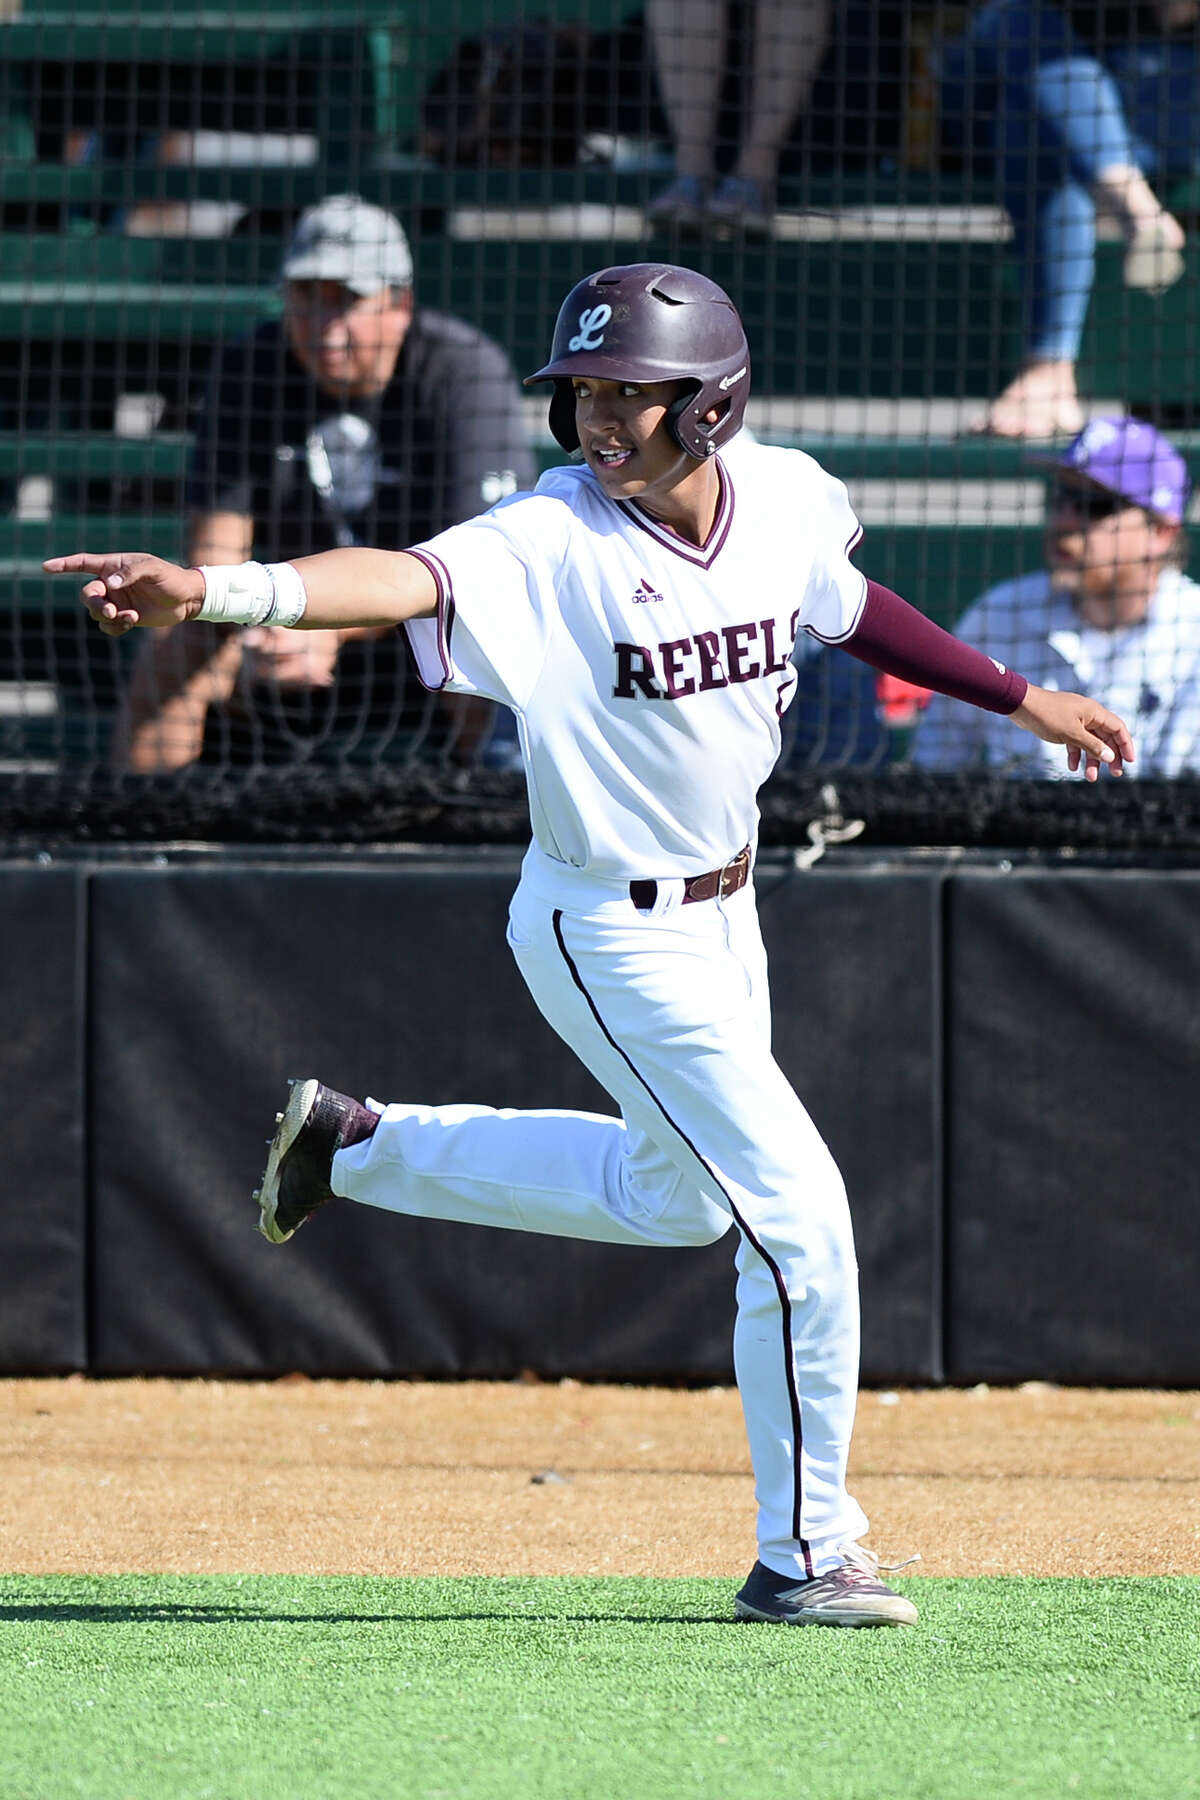 Lee's Junior Alvarez (5) celebrates after scoring a run against El Paso Franklin May 4, 2018, at McCanlies Field in Odessa. James Durbin/Reporter-Telegram